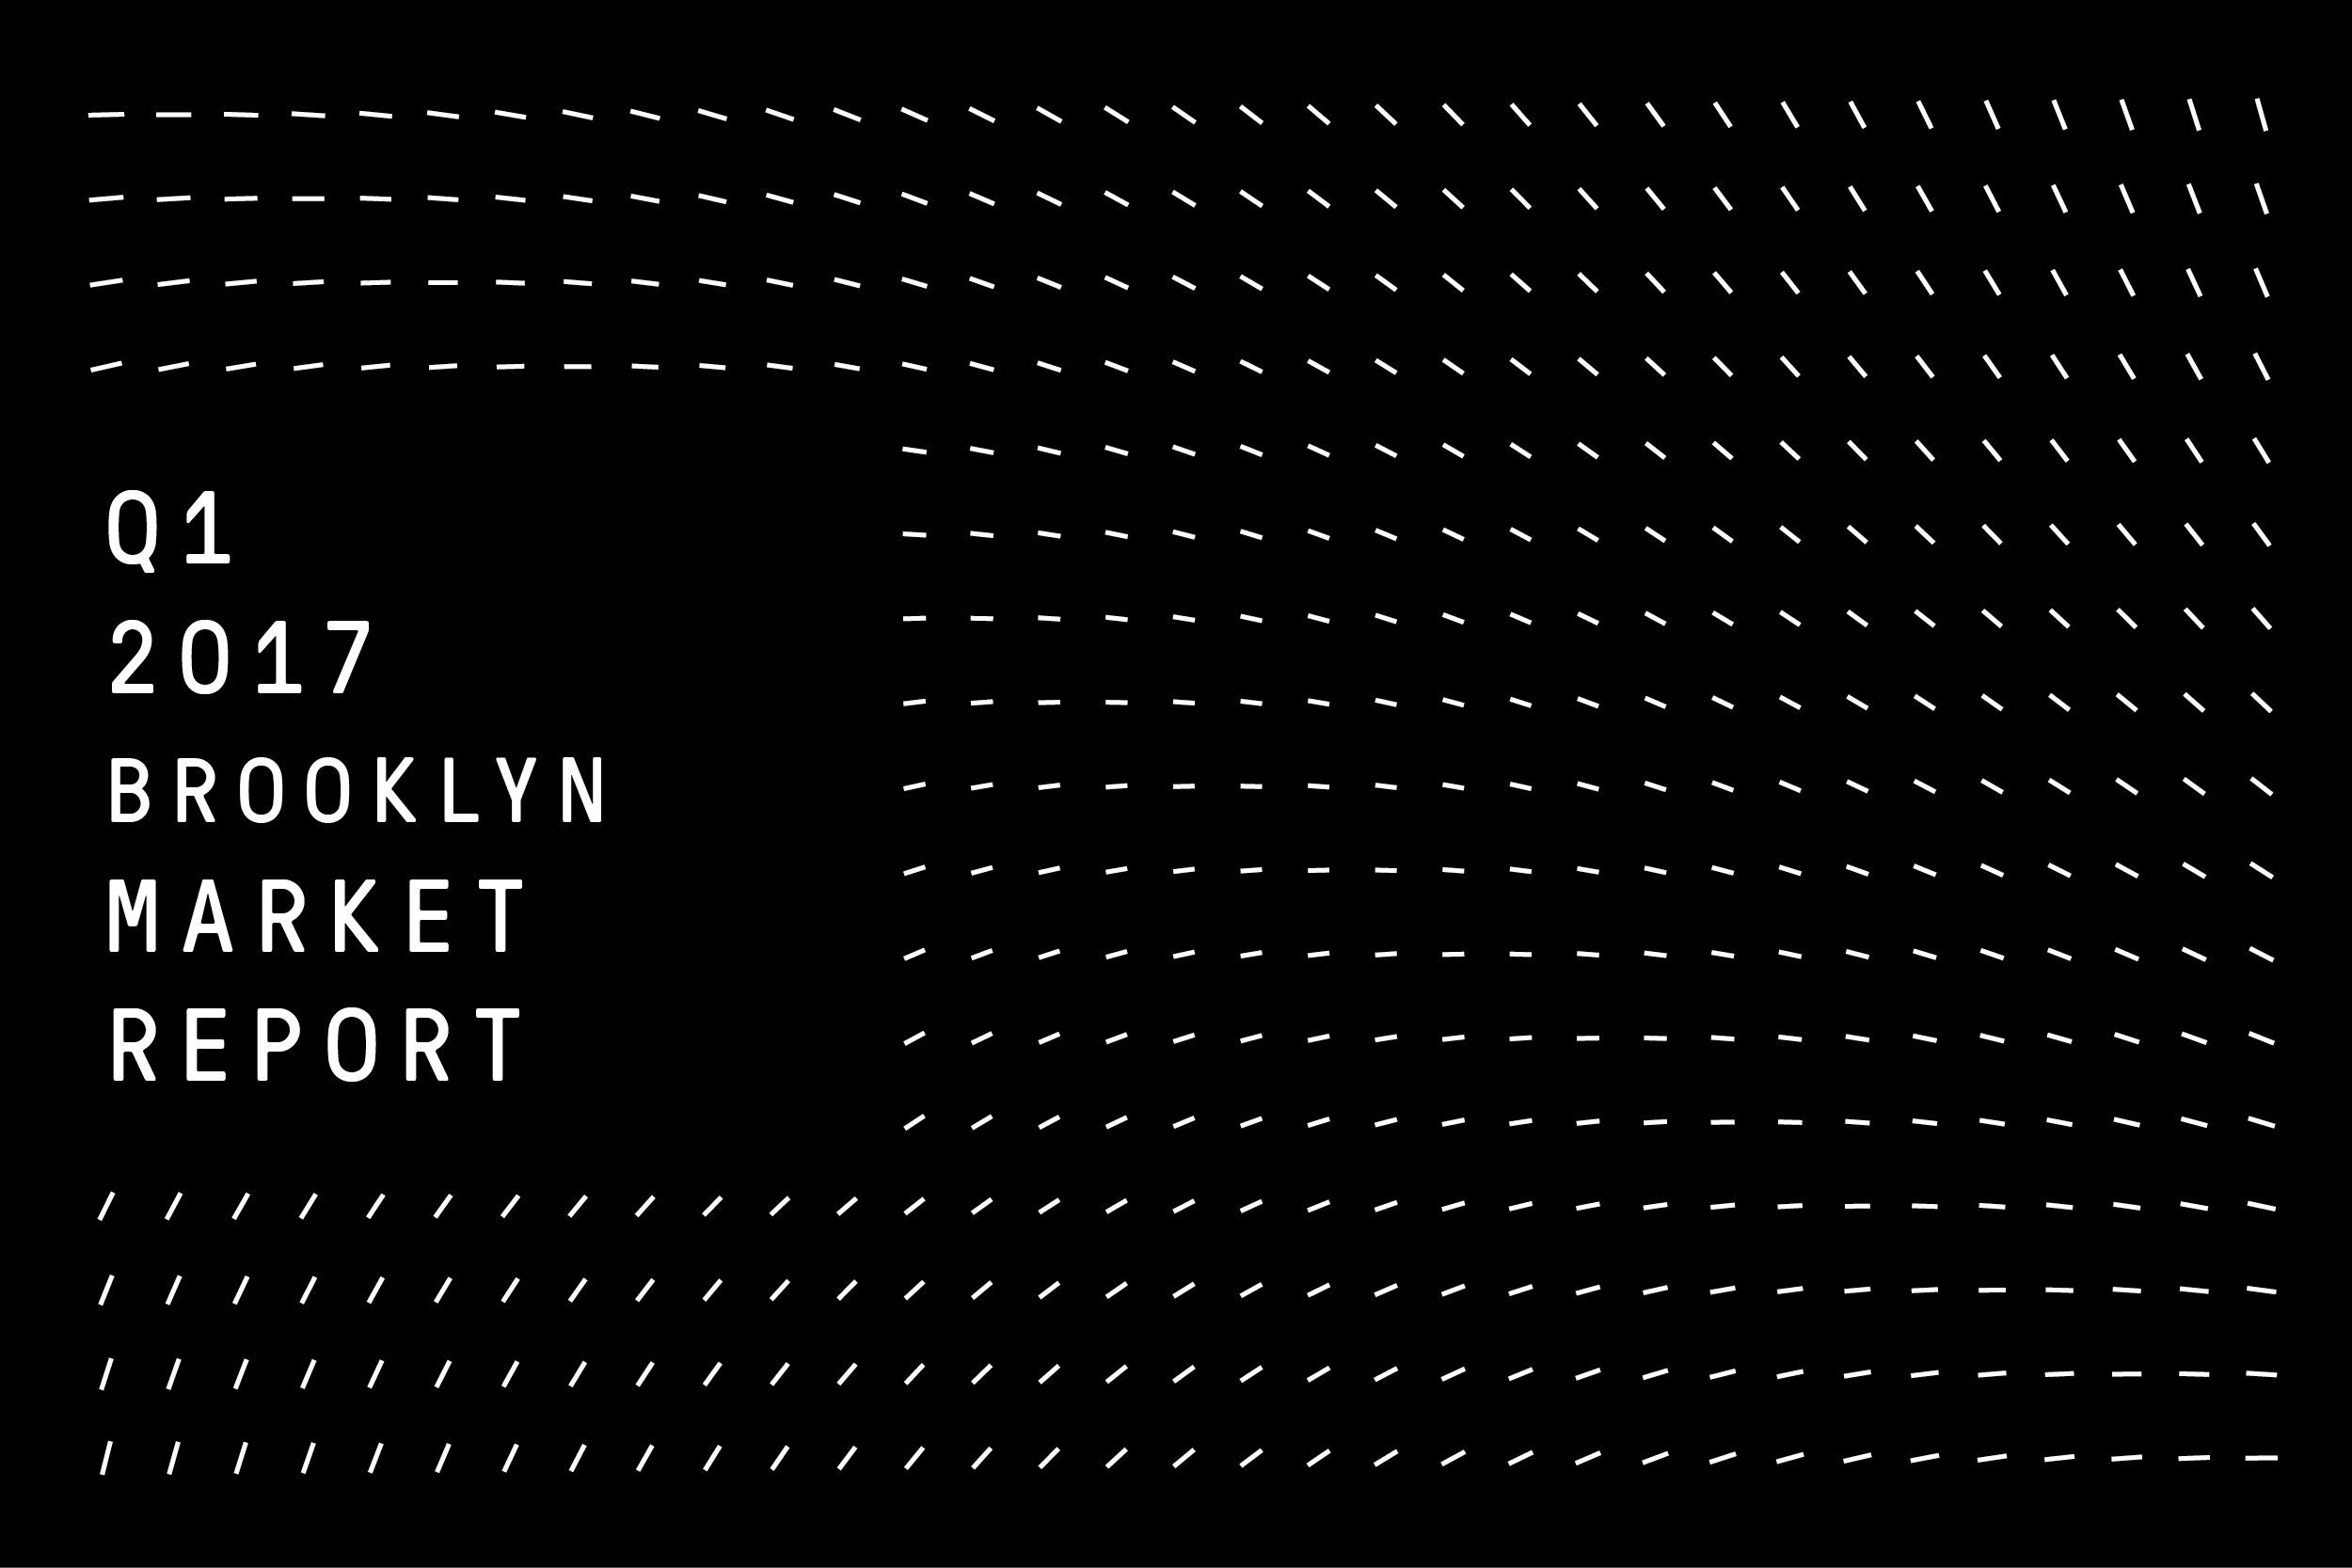 BROOKLYN Q1 2017 MARKET REPORT